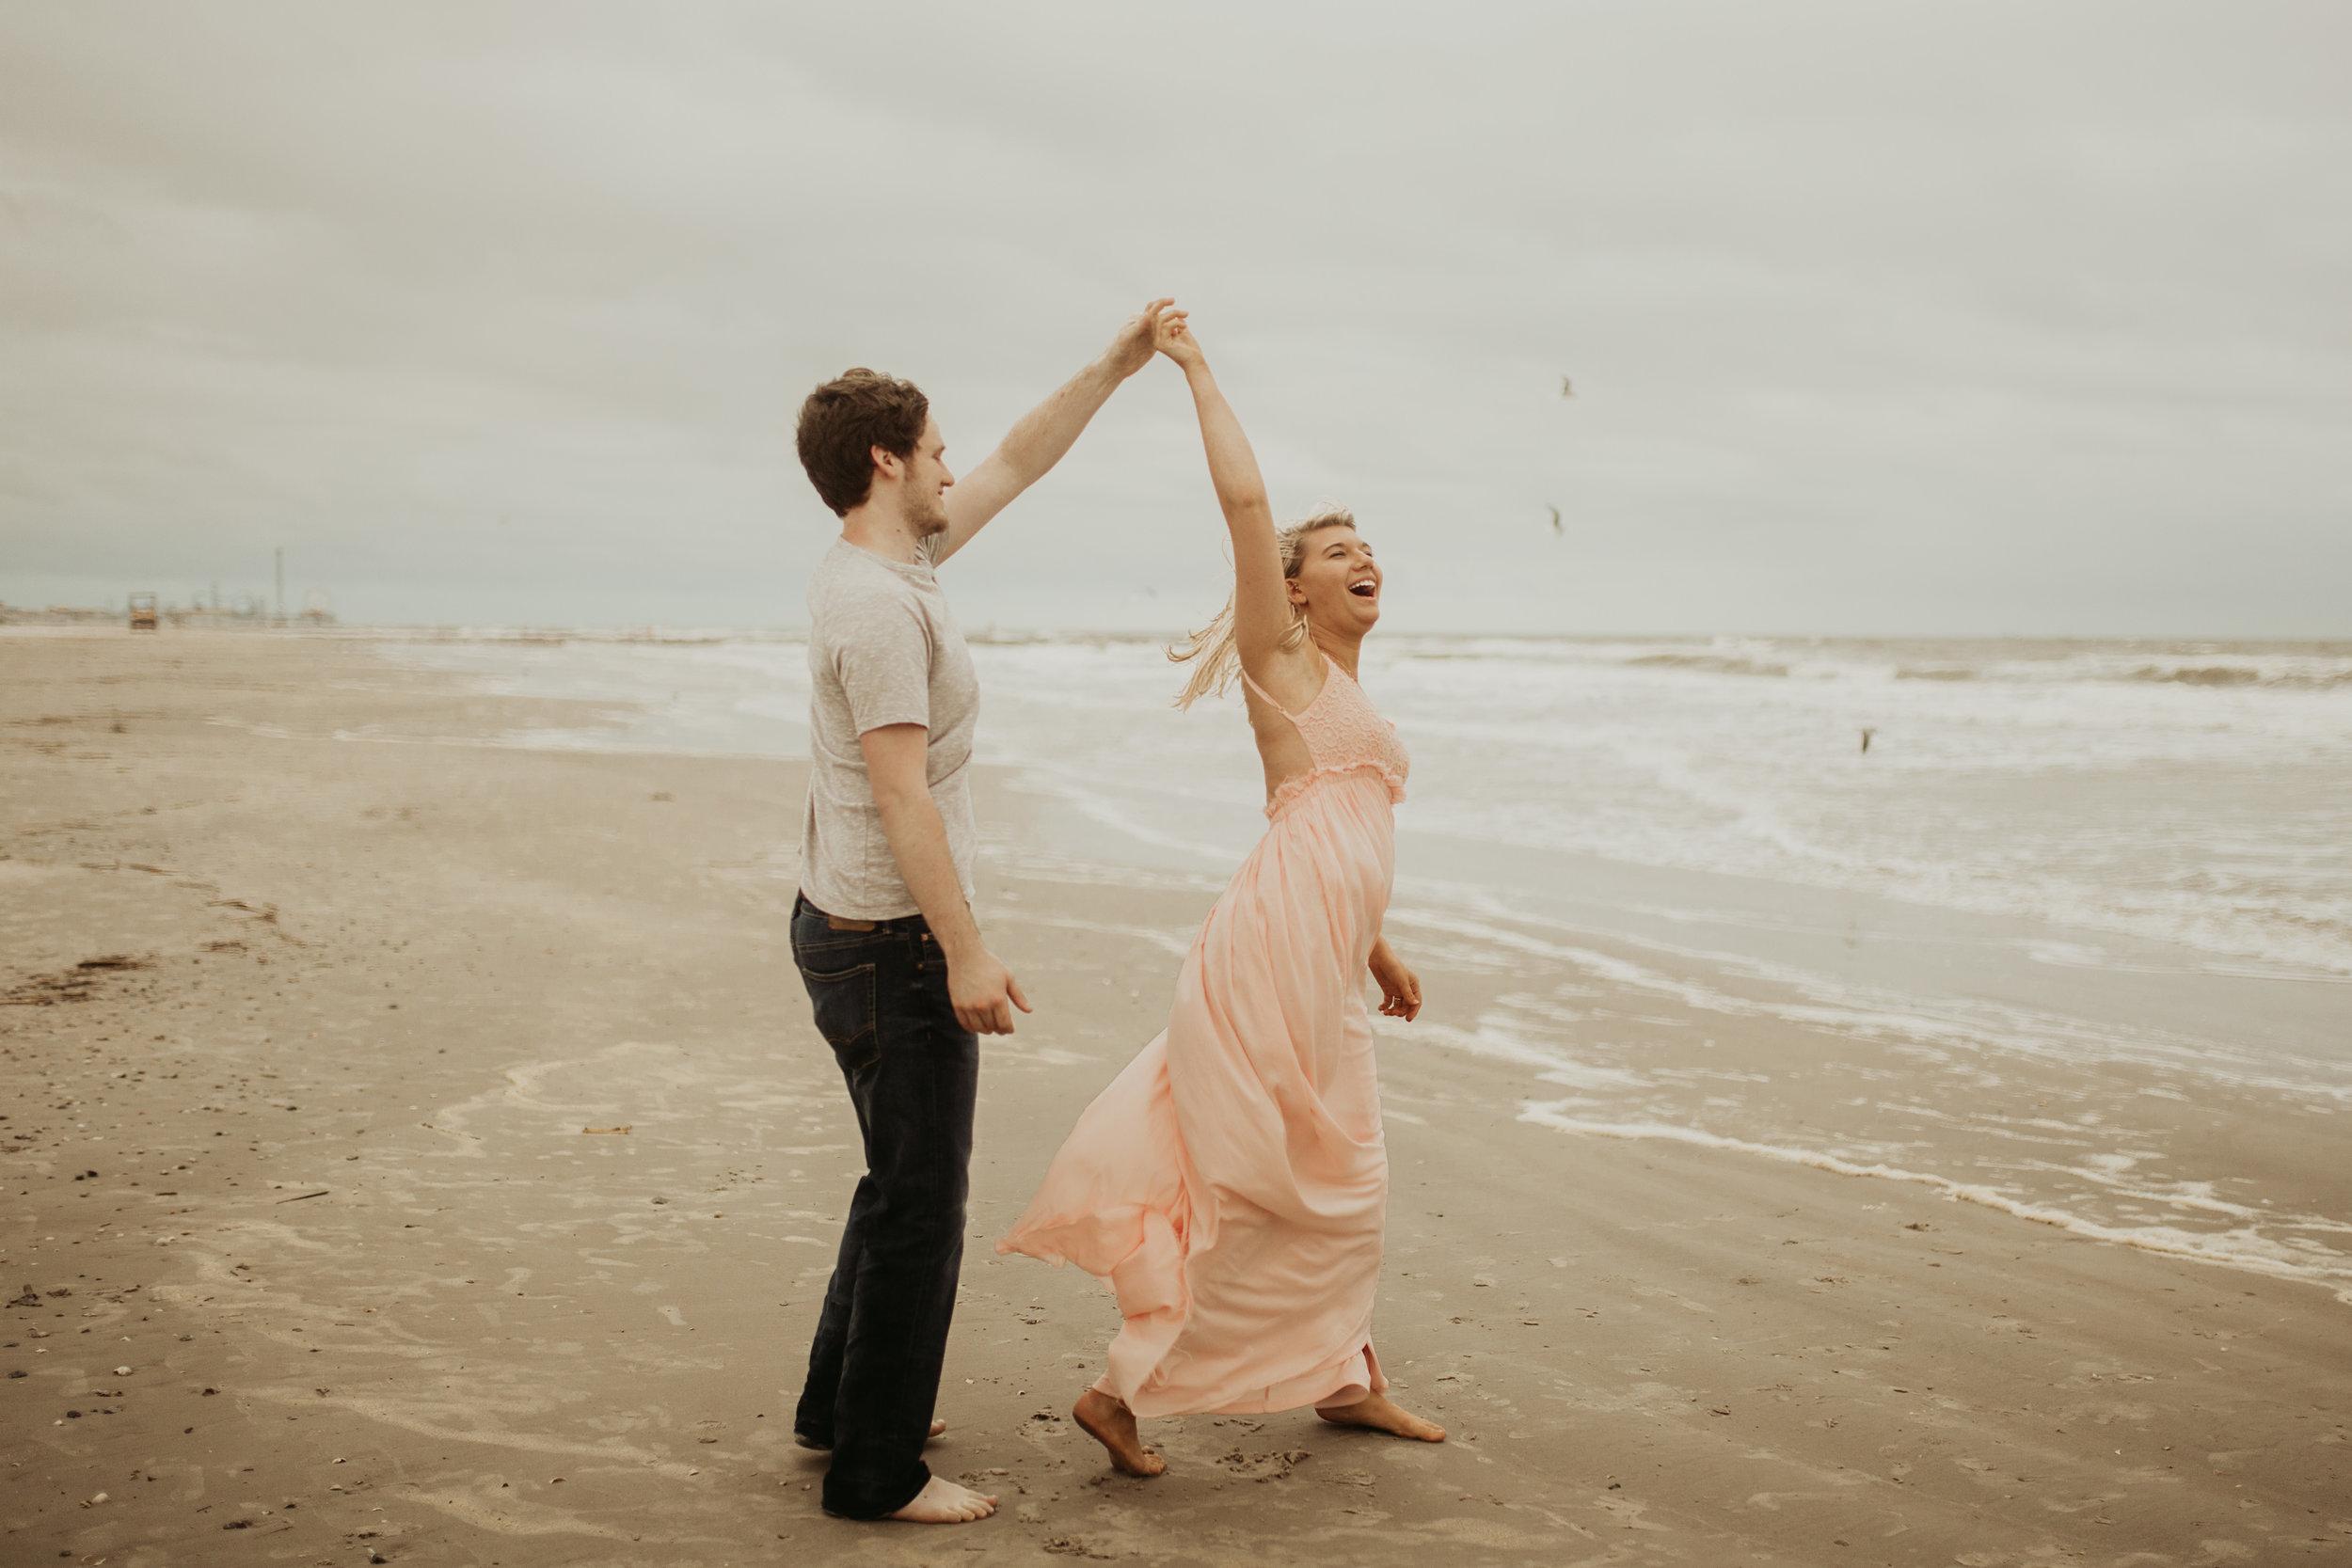 oceanside-california-hawaii-wedding-photographer13.jpg